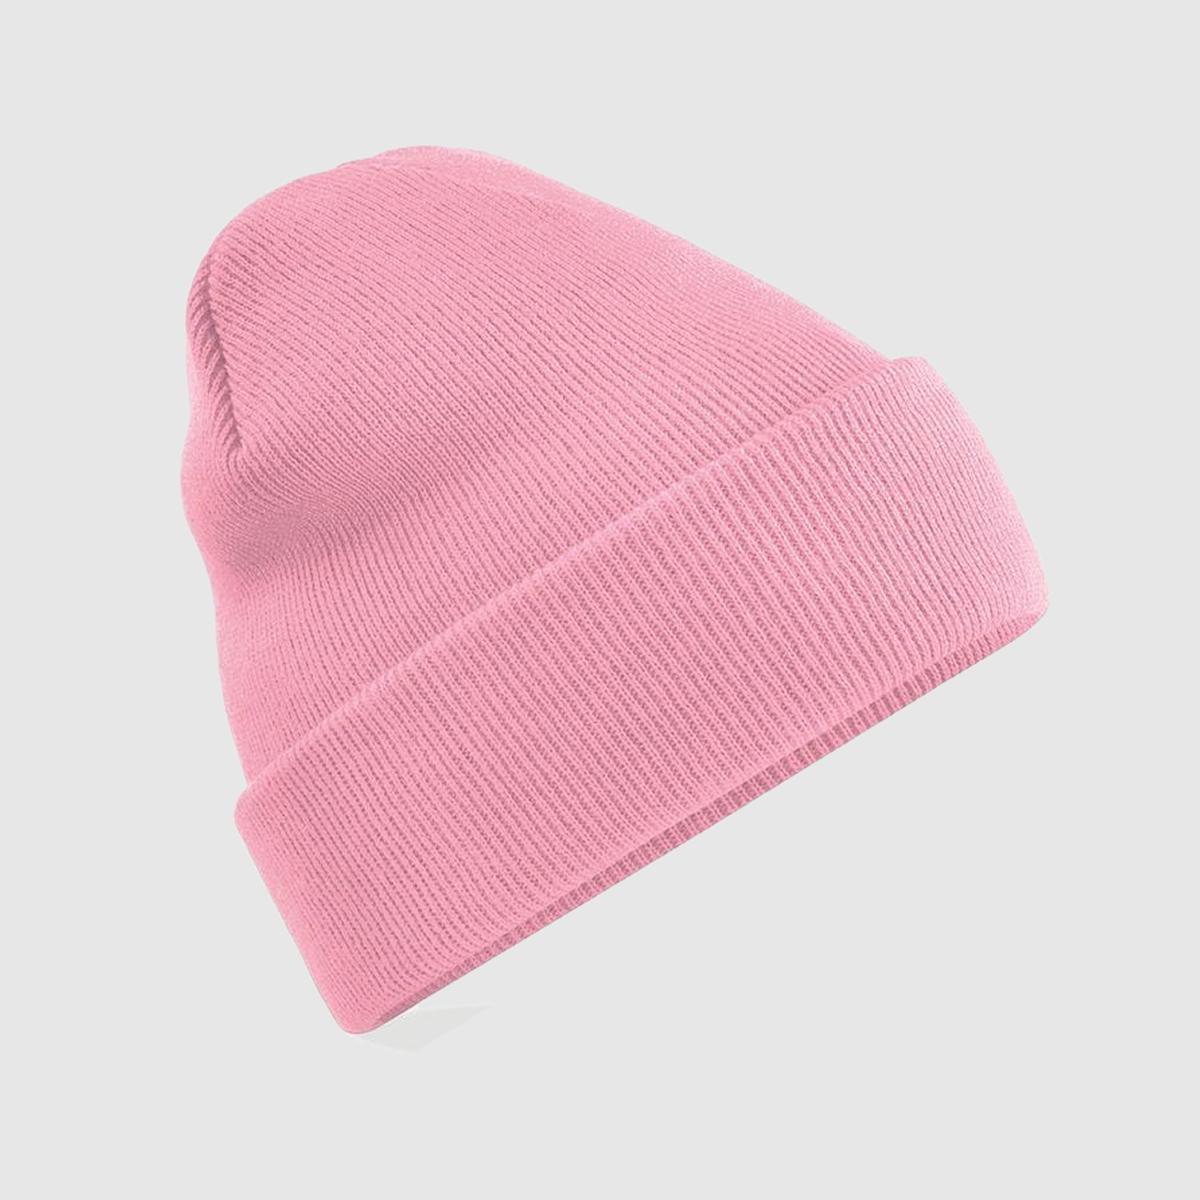 Gorro de punto con borde vuelto color rosa empolvado.